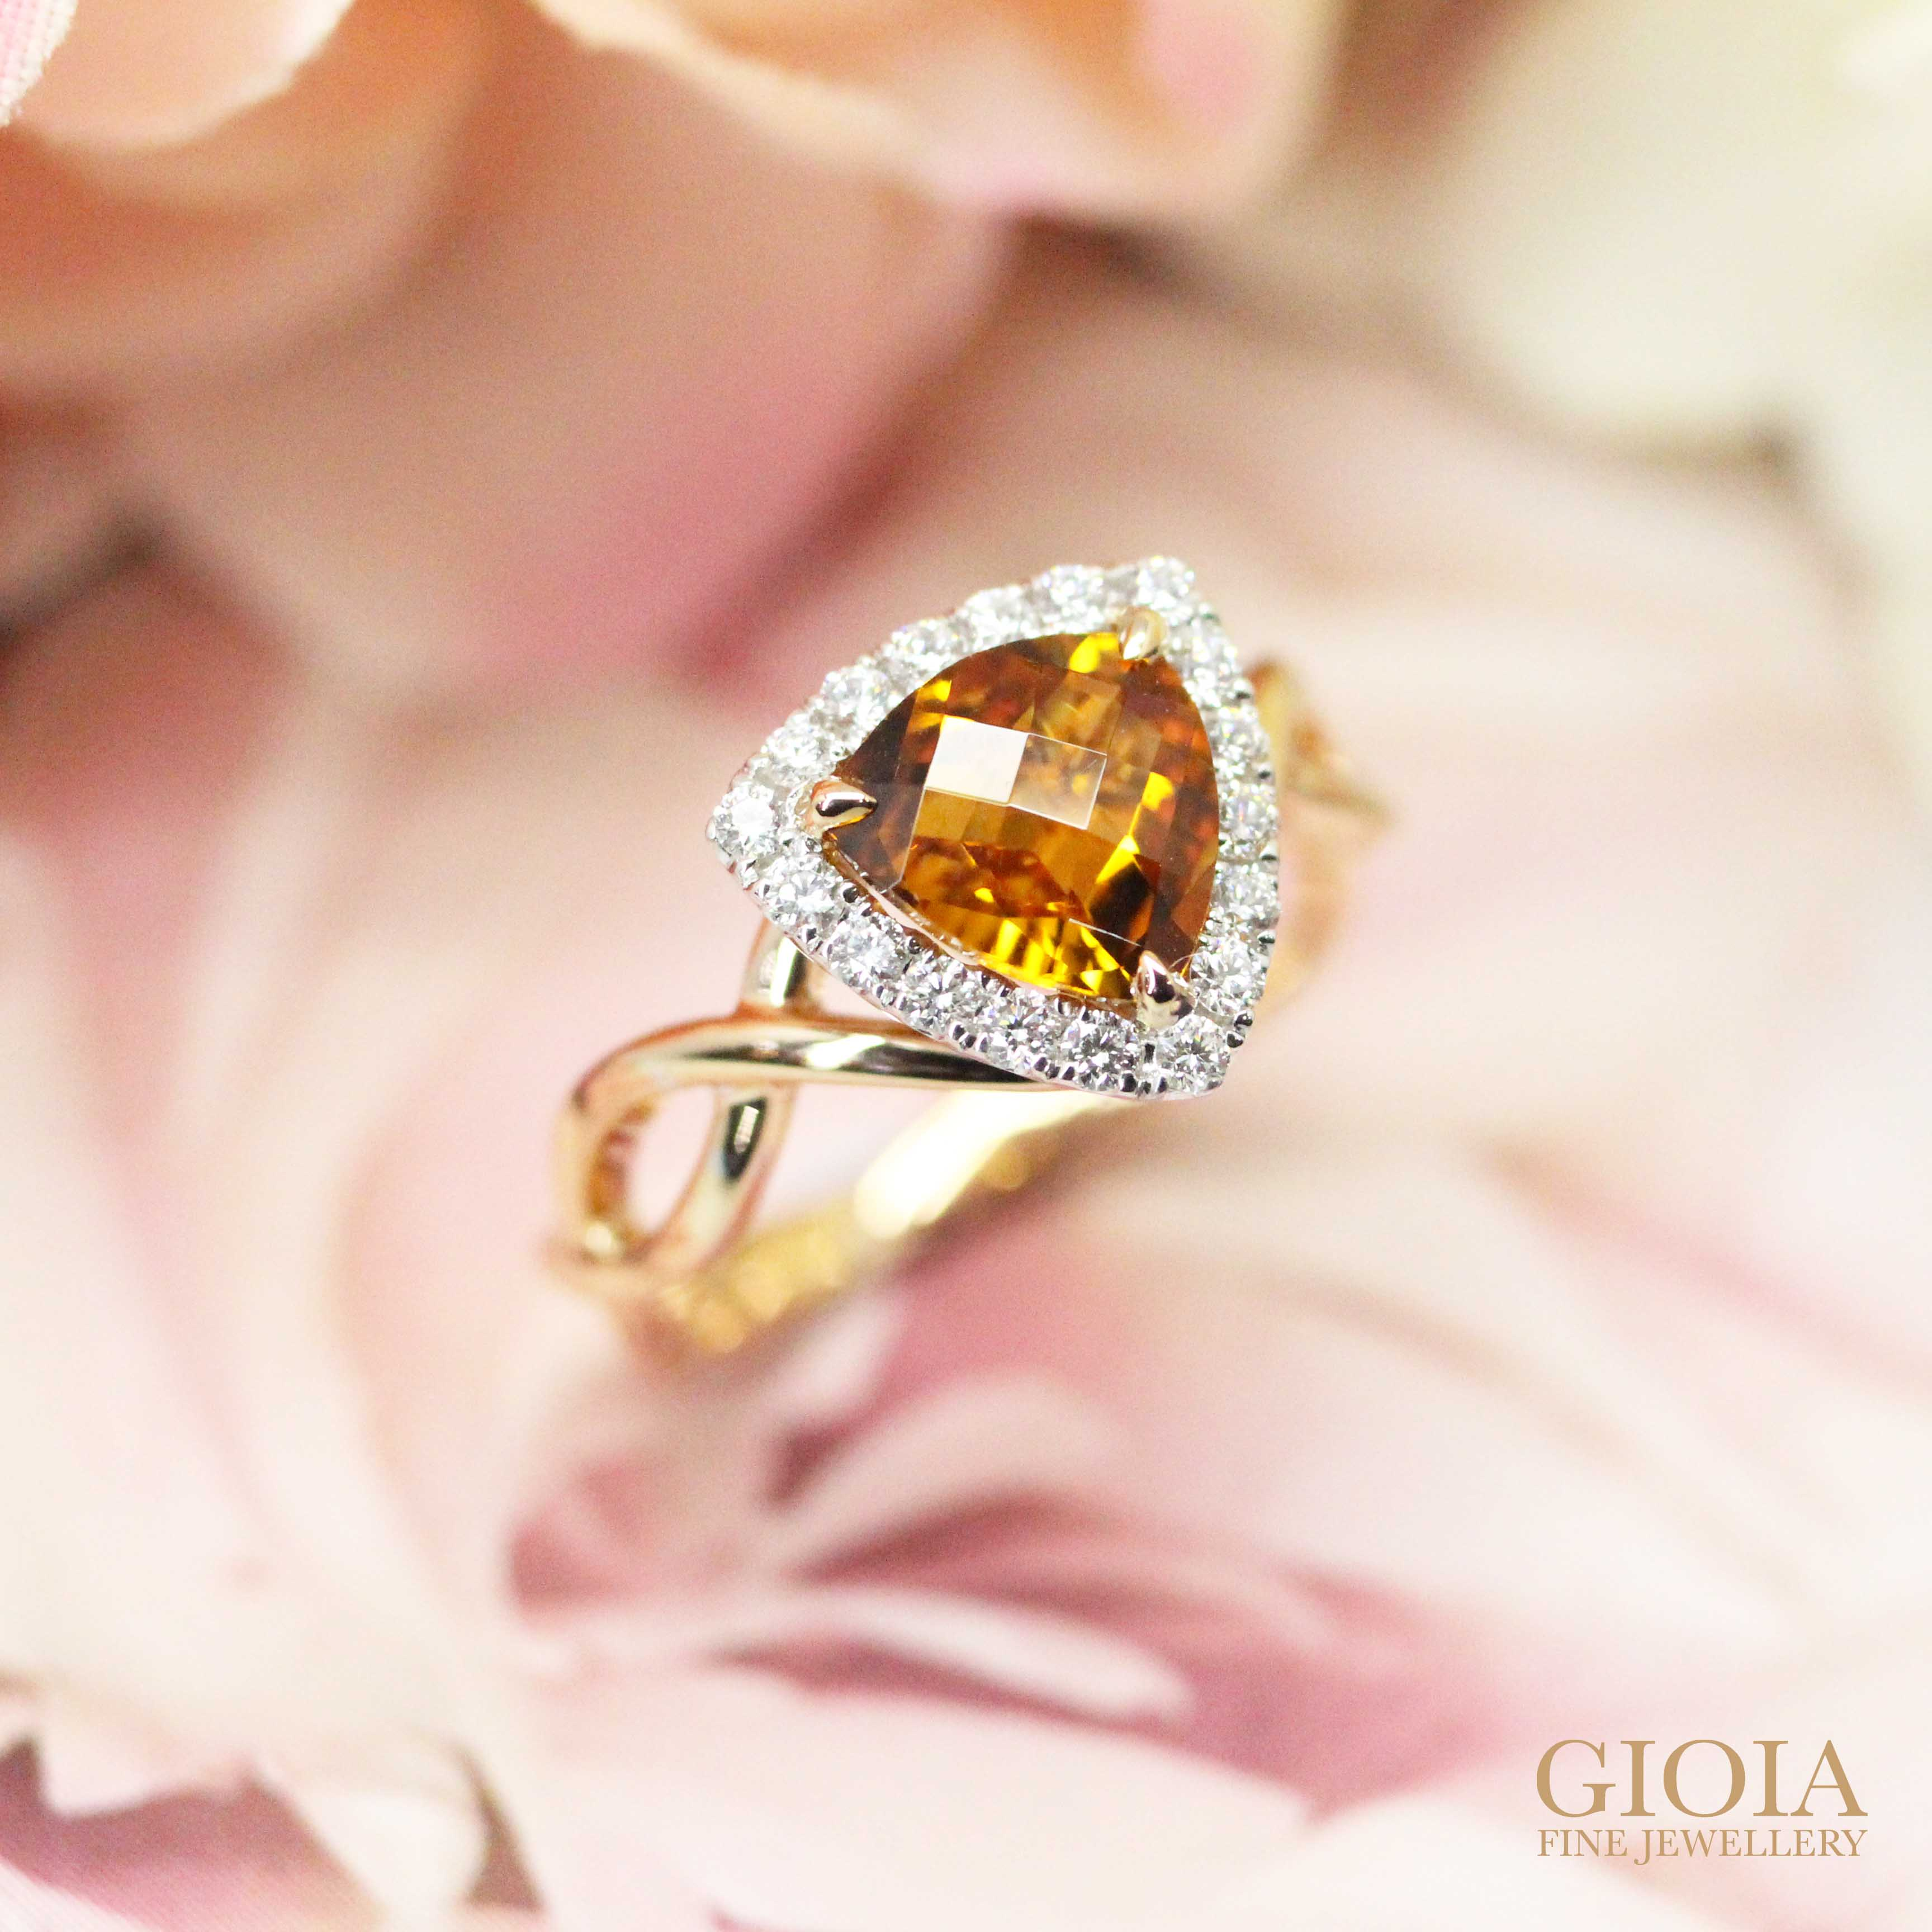 trilliant cut orange gemstone custom set in round brilliant diamonds and twisted bands | Local Singapore designer jewellery at GIOIA FINE JEWELLERY